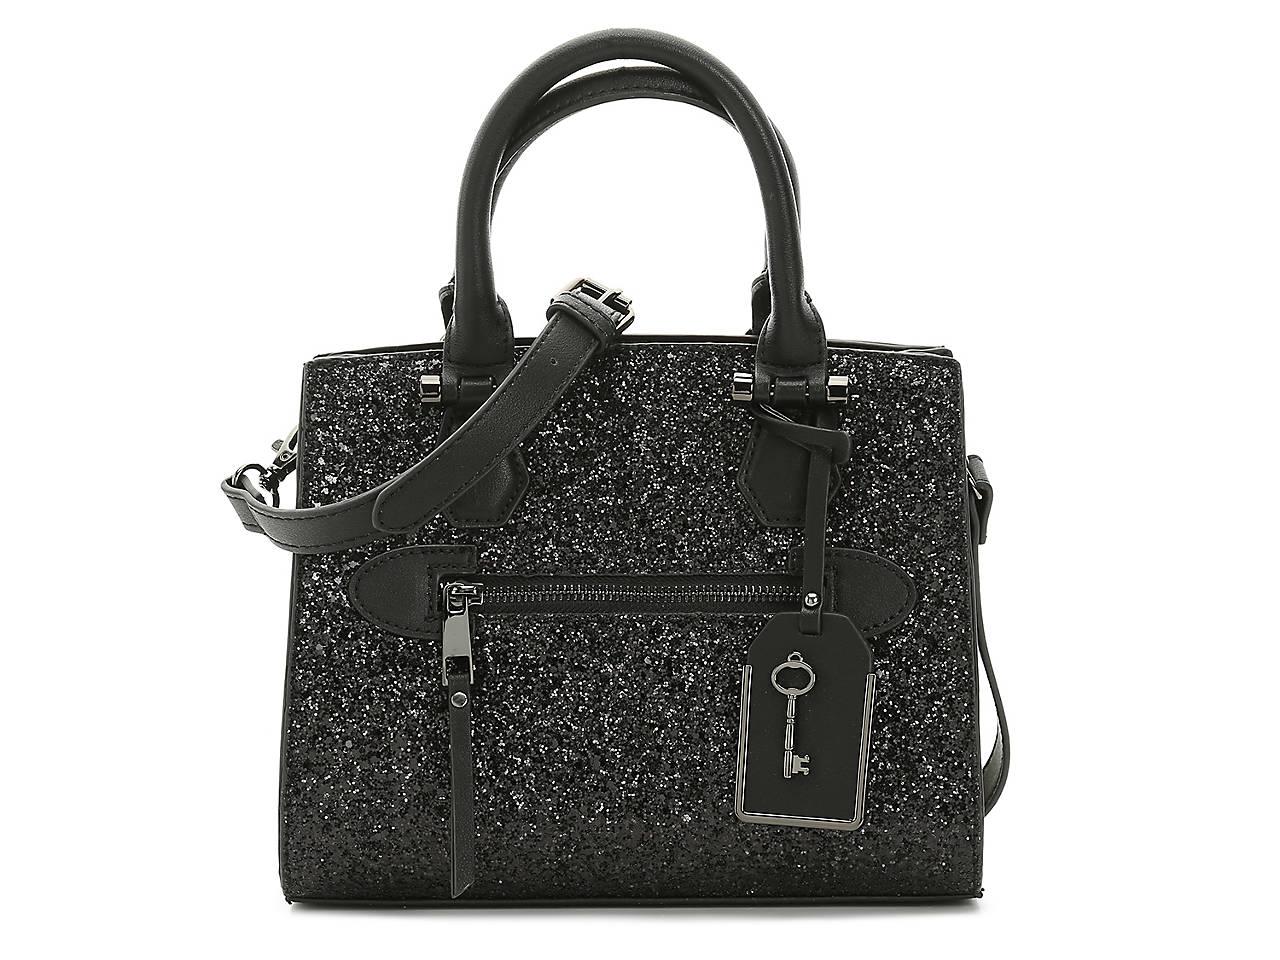 a372cb223e0 Aldo Repen Satchel Women s Handbags   Accessories